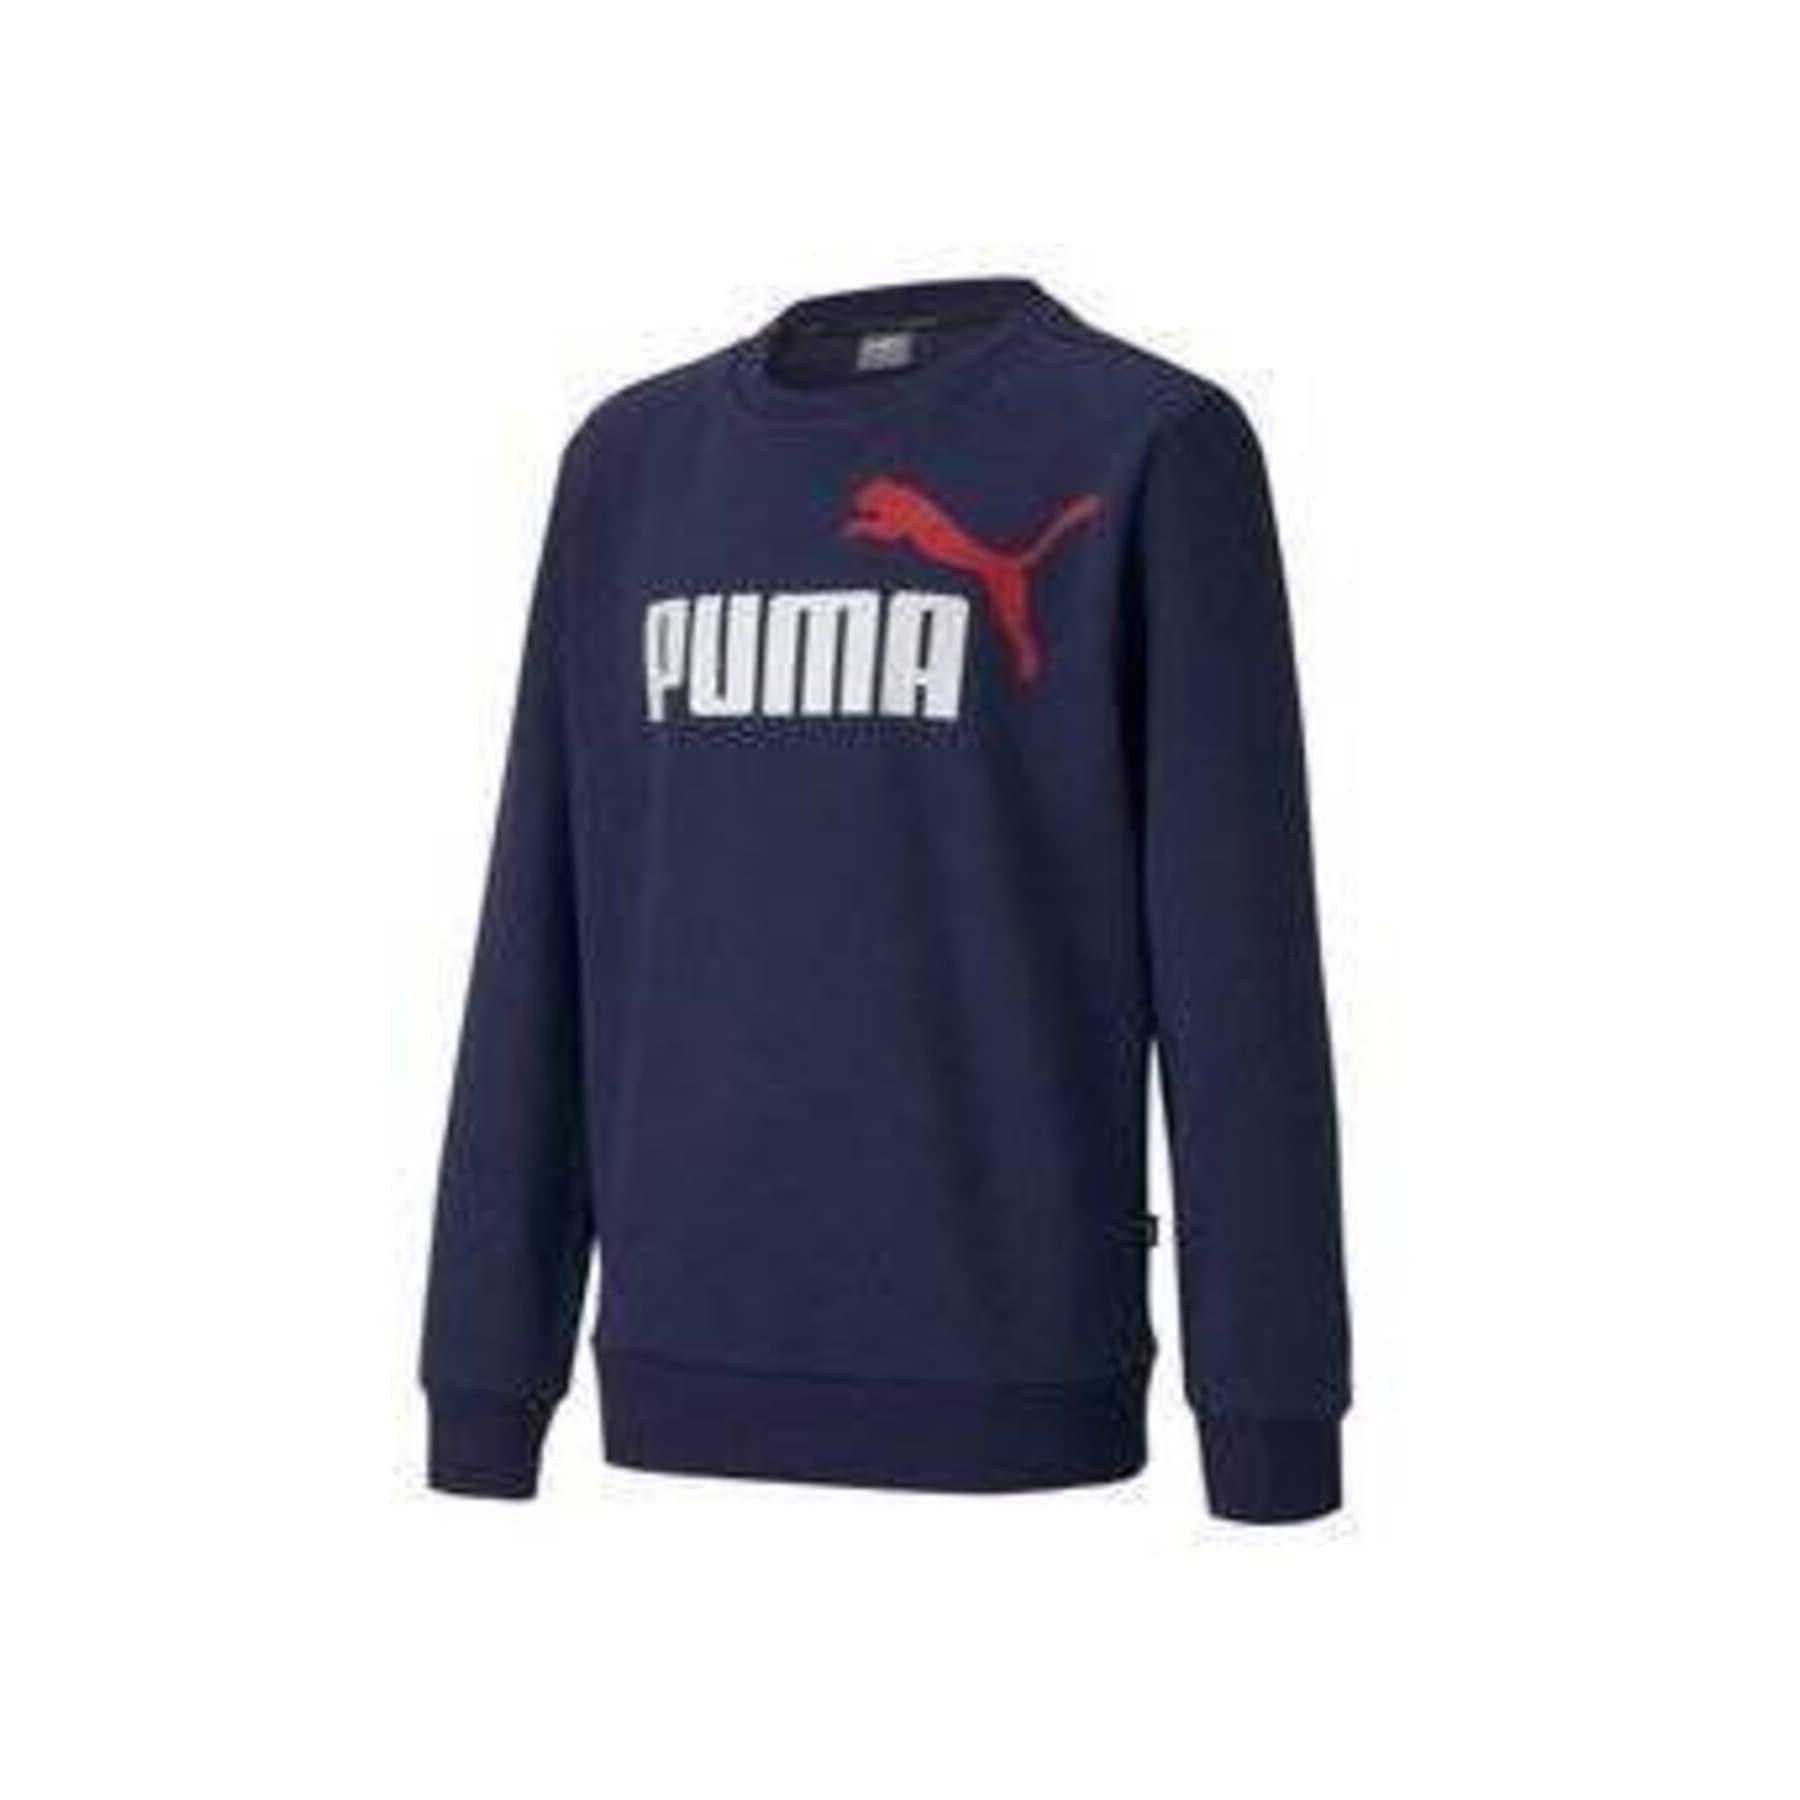 Essential Col Crew Çocuk Lacivert Sweatshirt (583231-06)